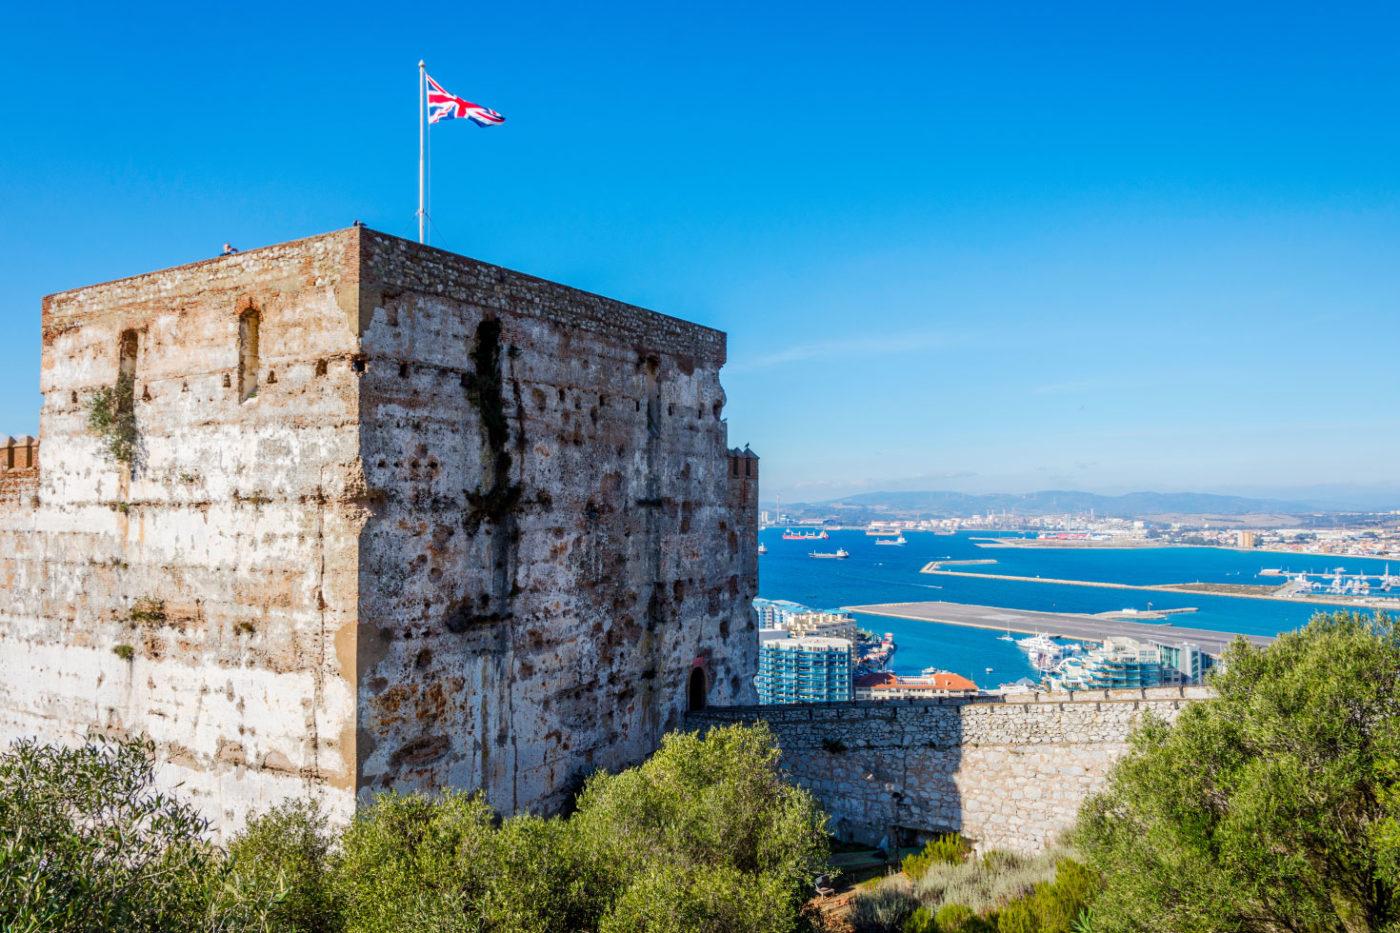 Moorish Castle With British Flag Flying